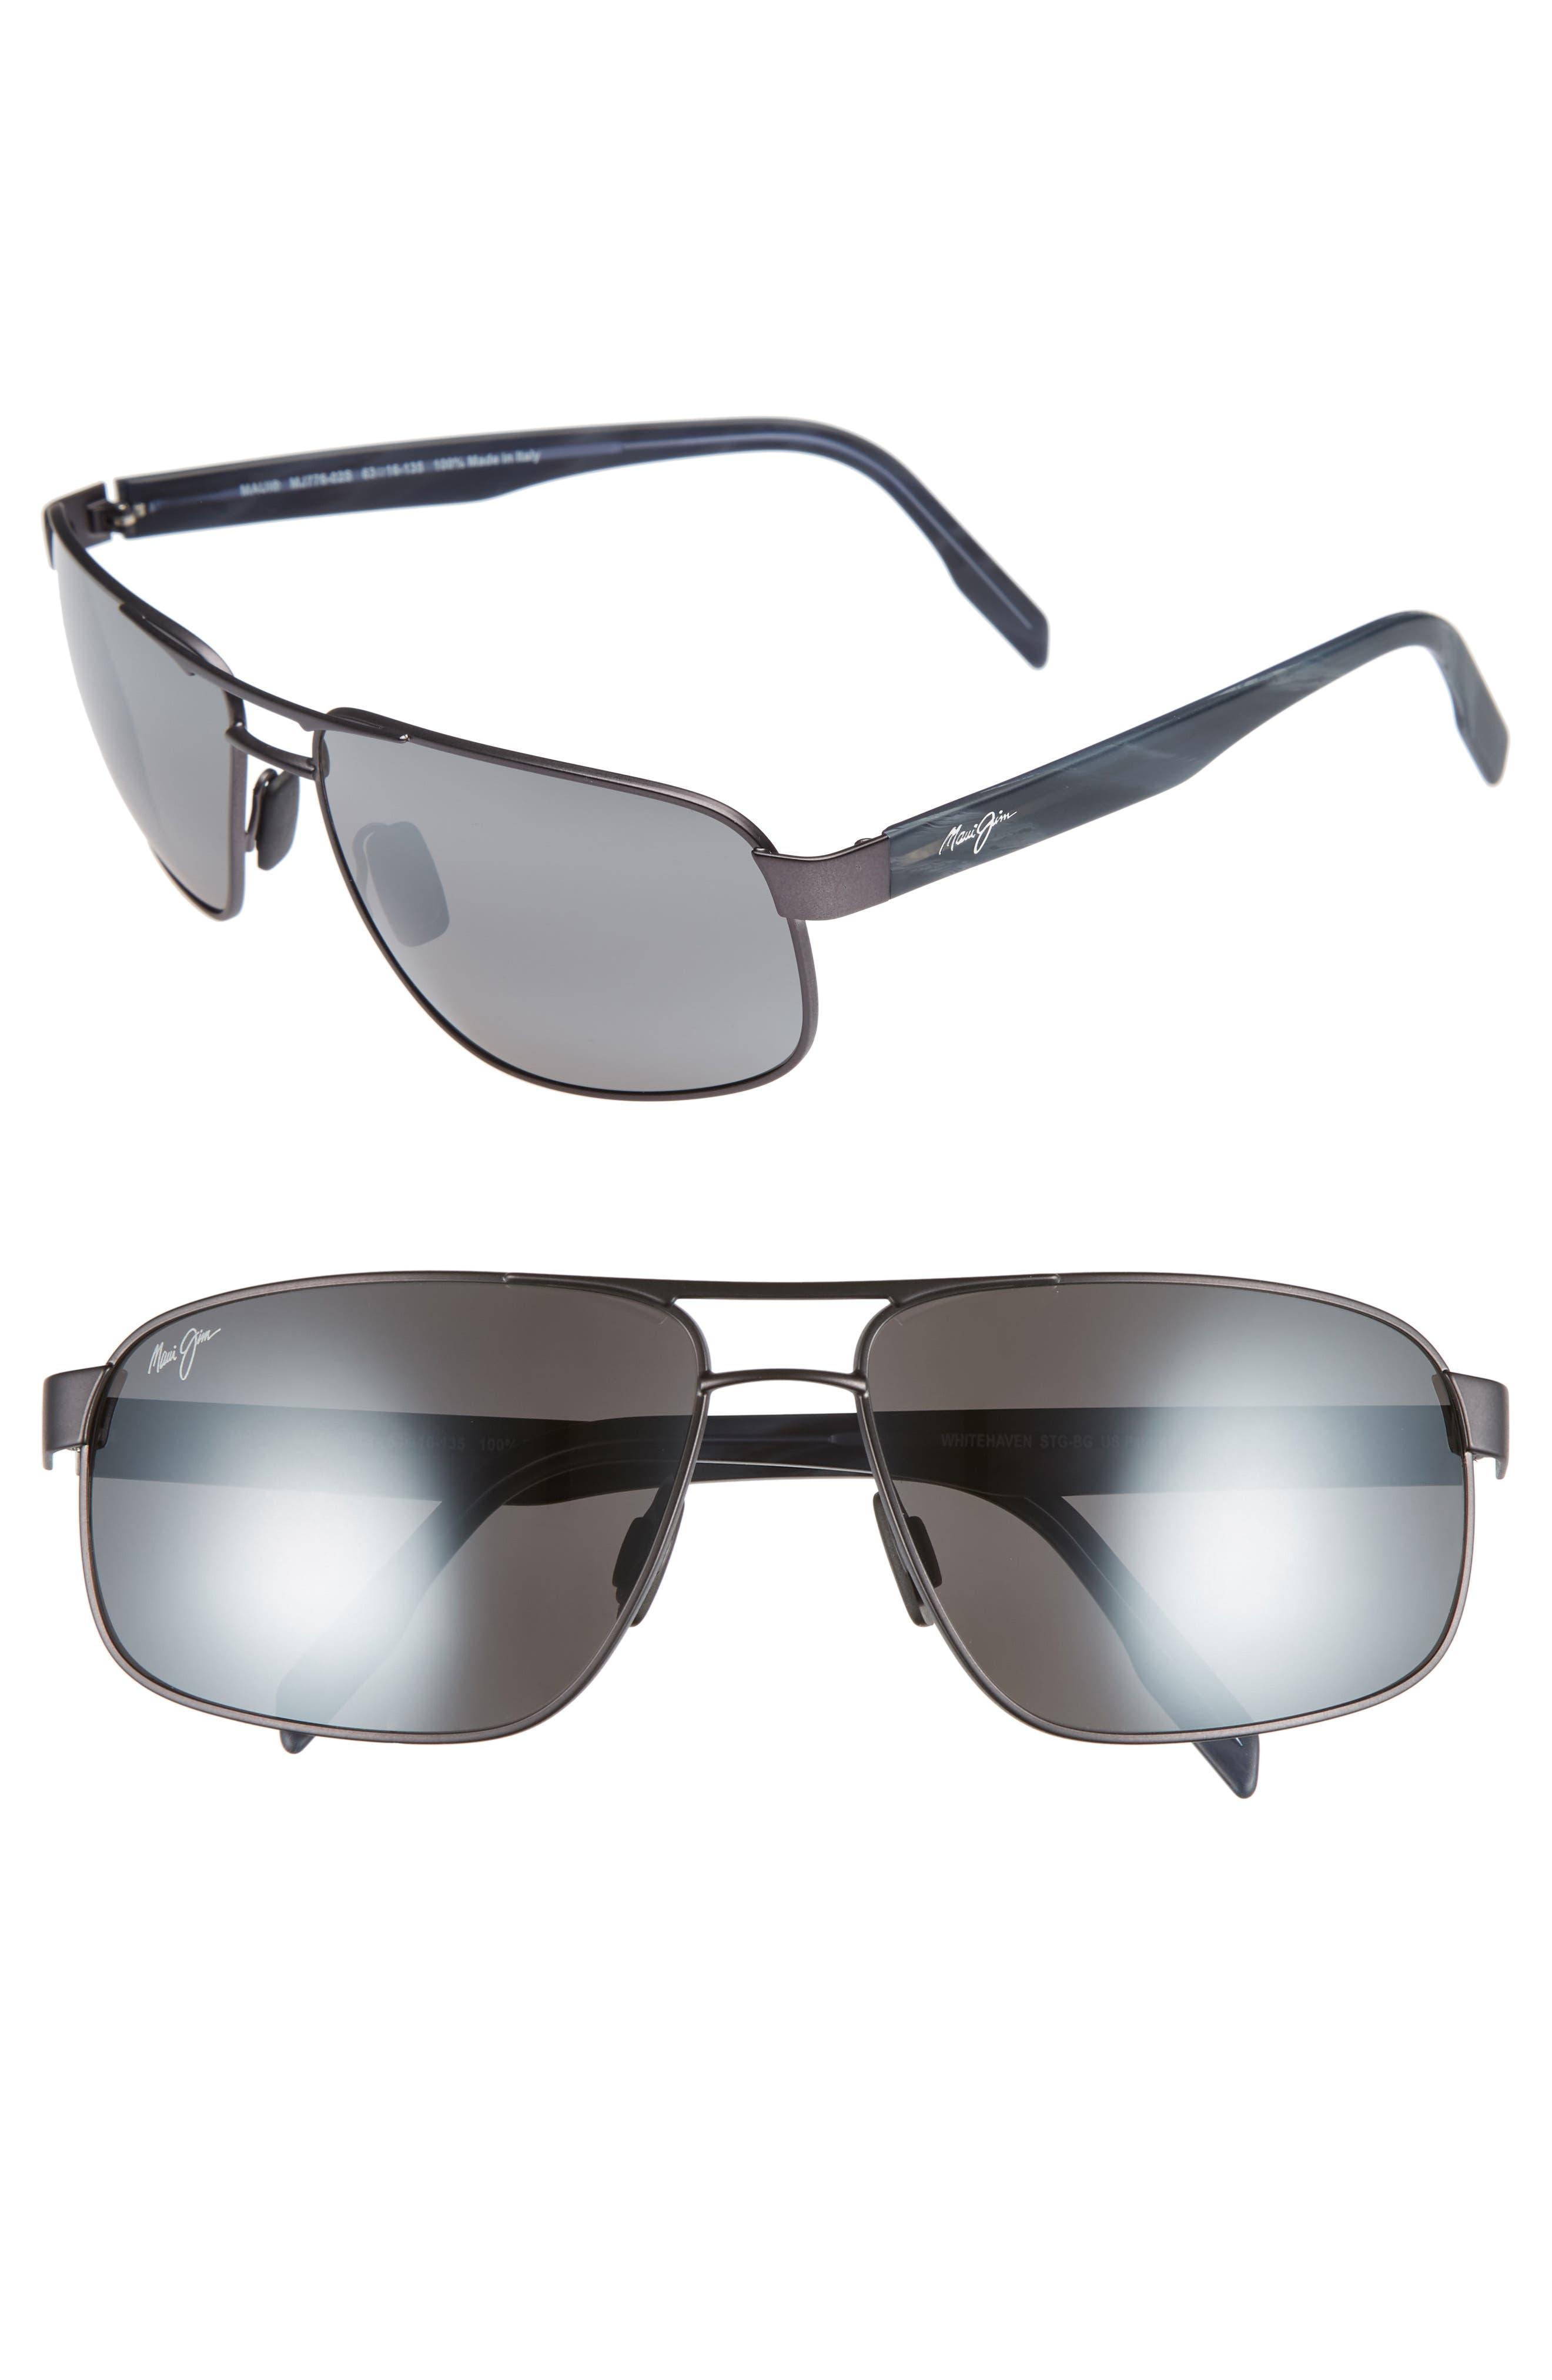 Whitehaven 63mm Polarized Sunglasses,                         Main,                         color,